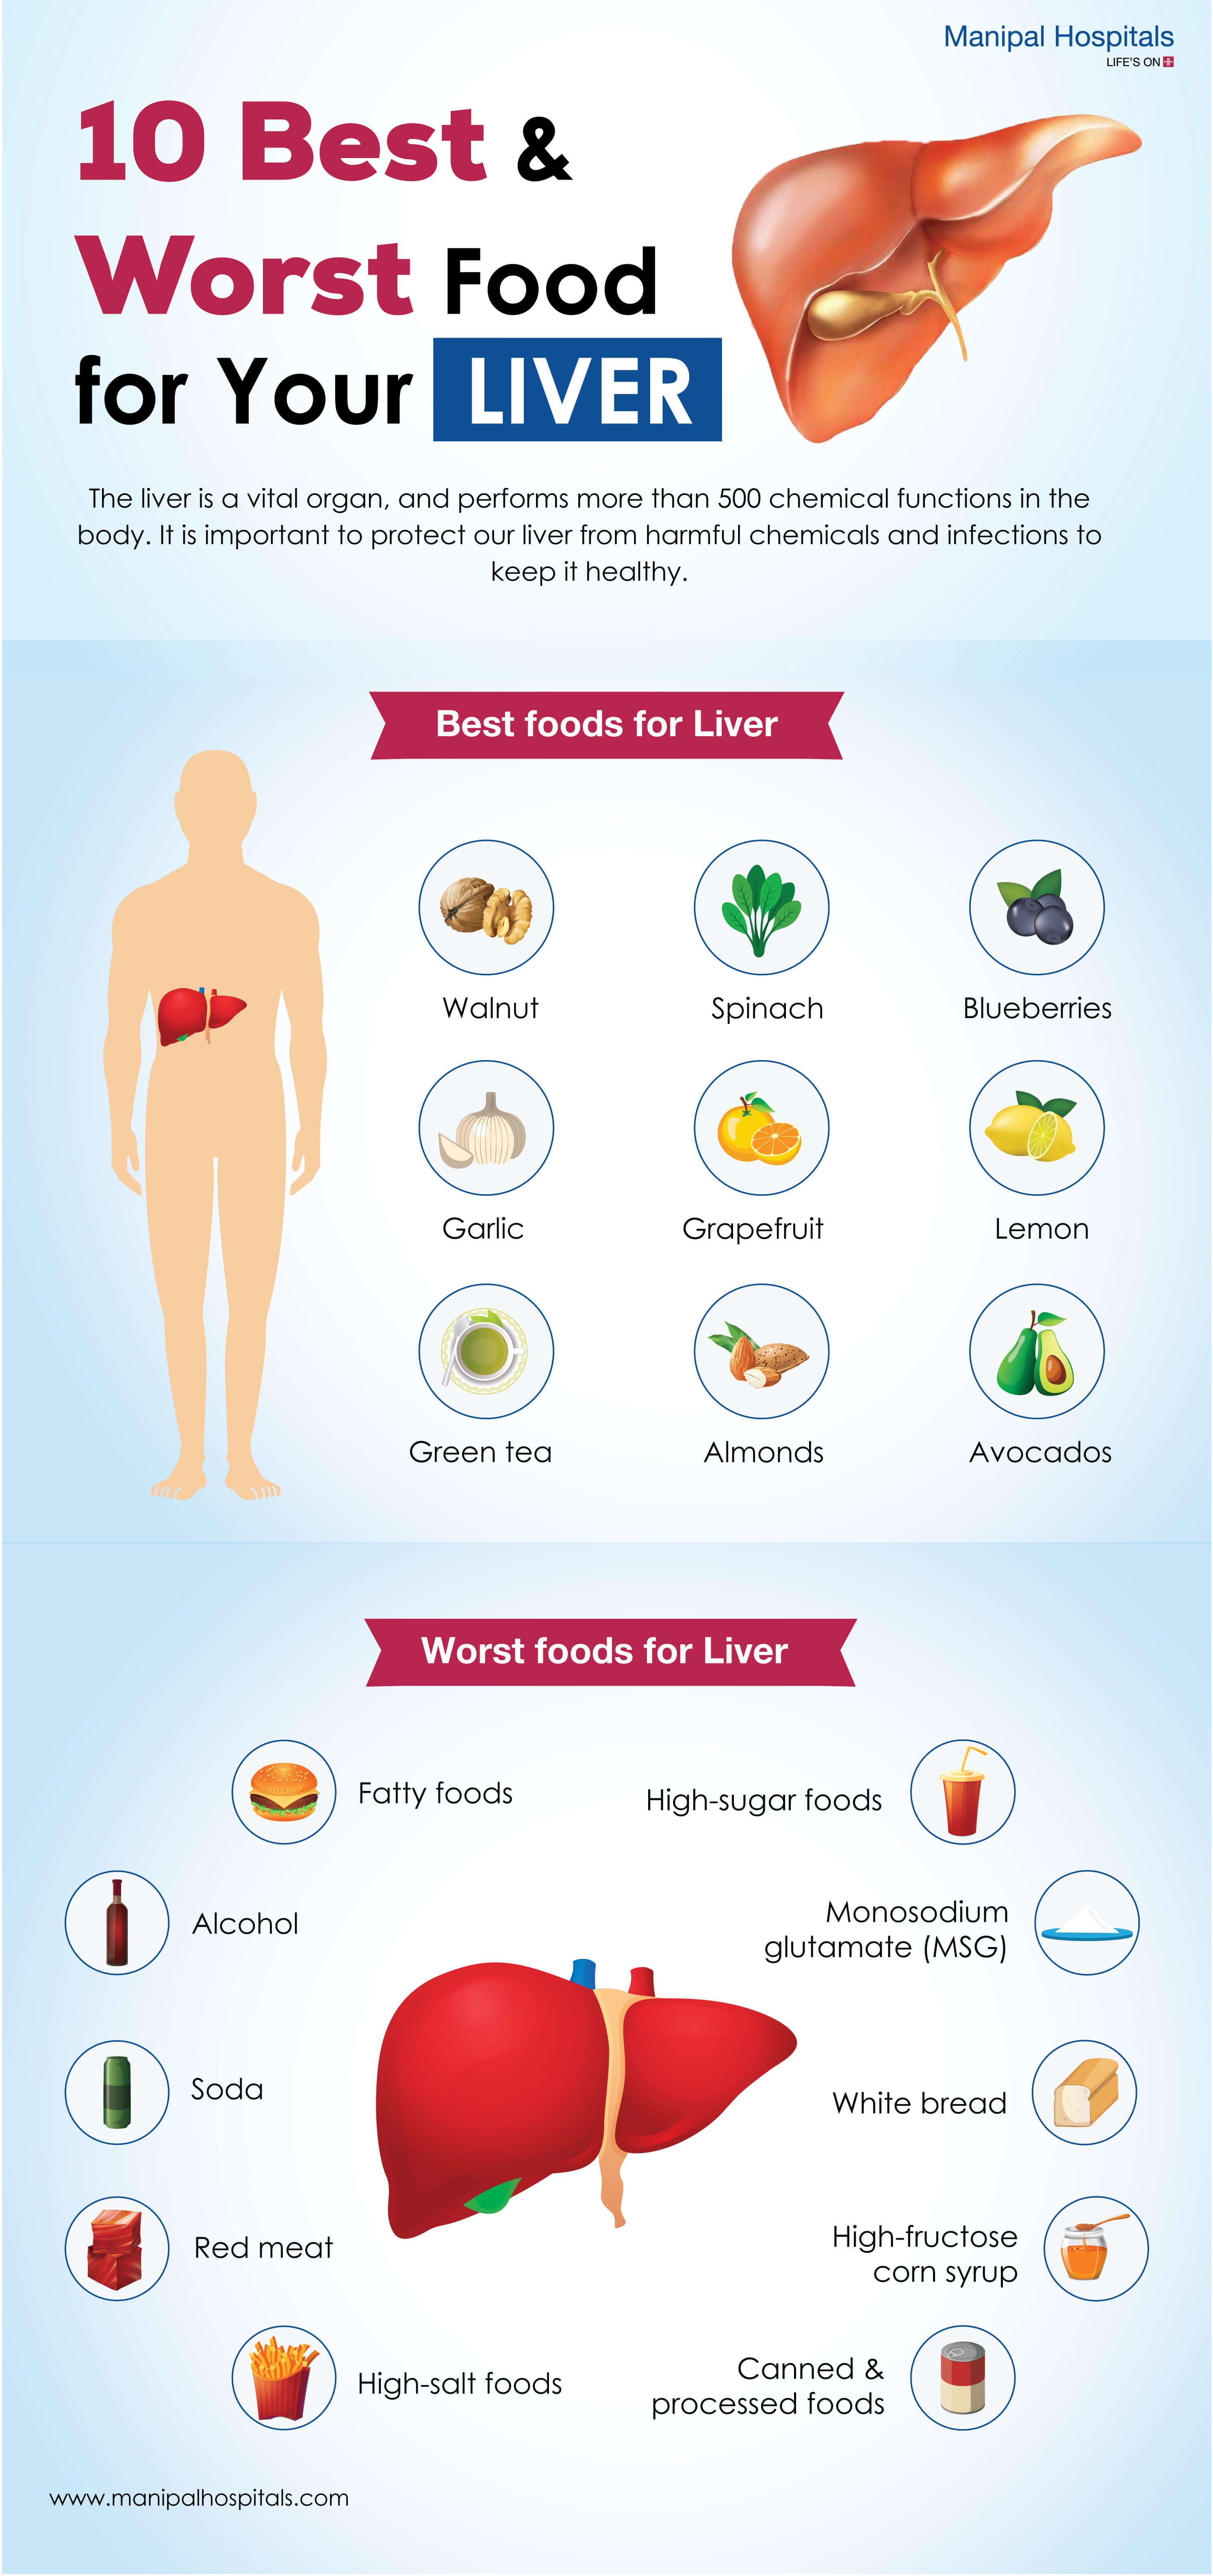 Detox-Your-Liver-infographic-plaza